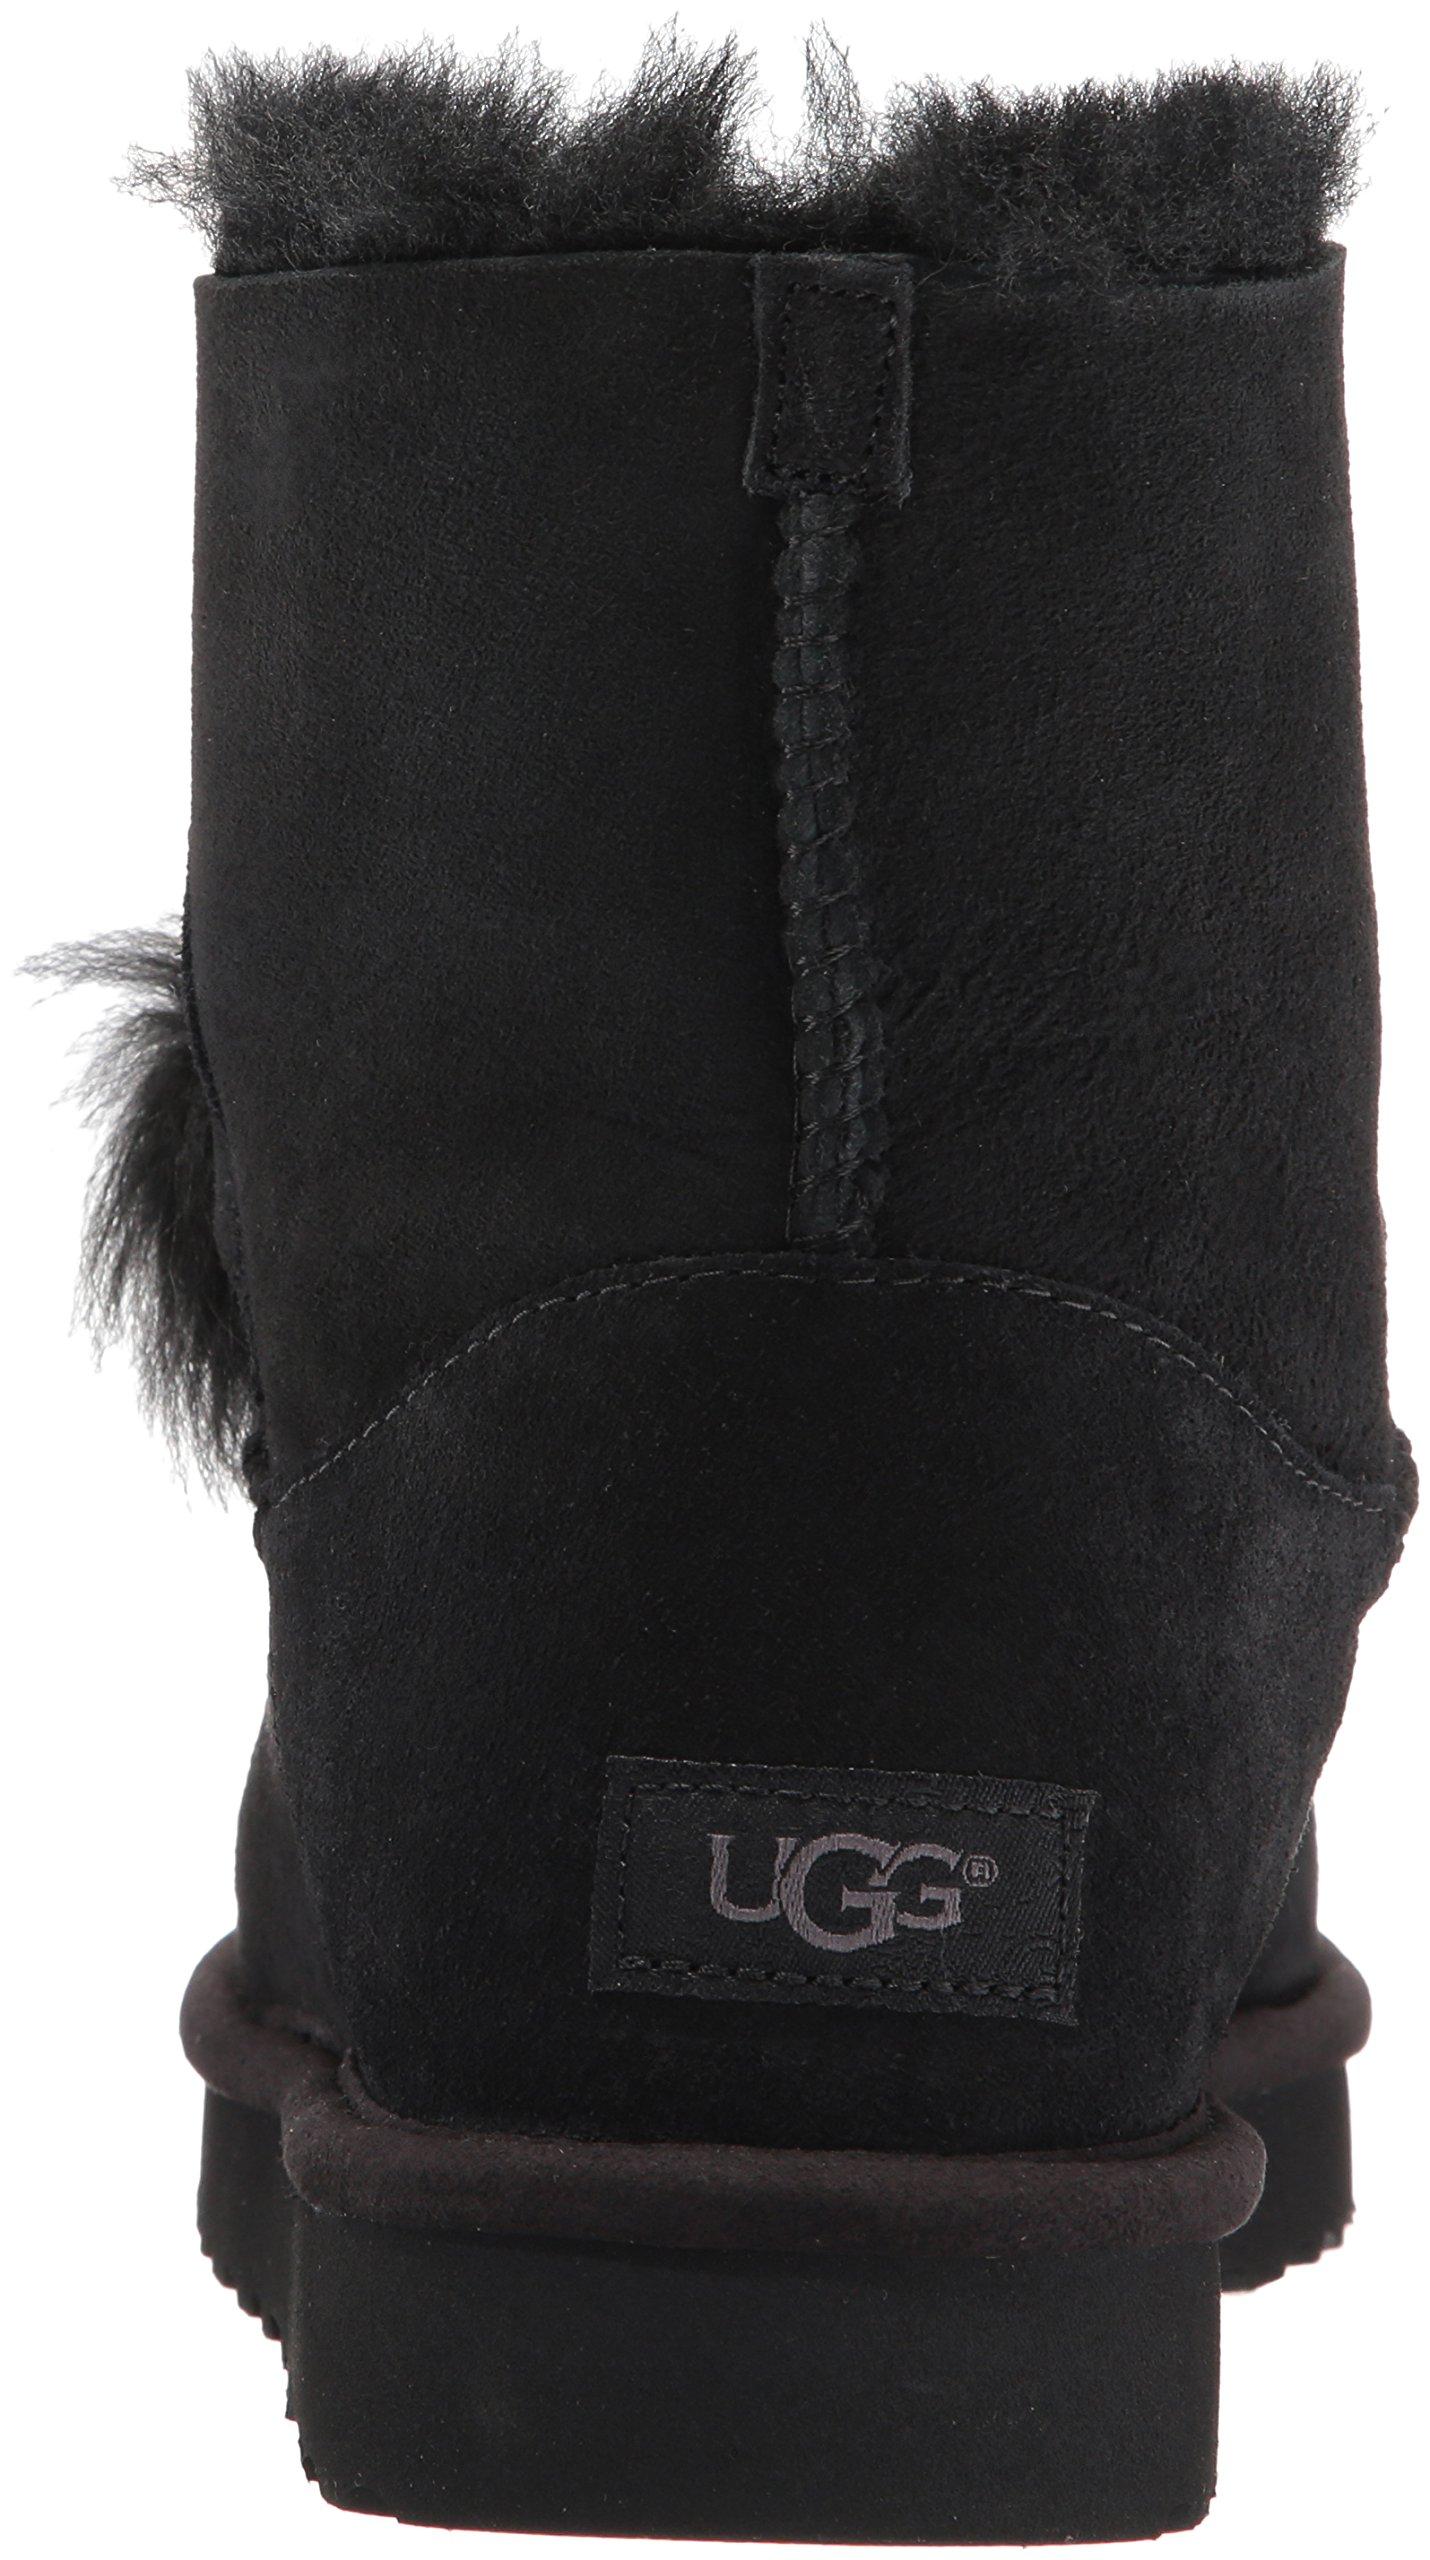 UGG Women's Gita Combat Boot, Black, 8 M US by UGG (Image #2)